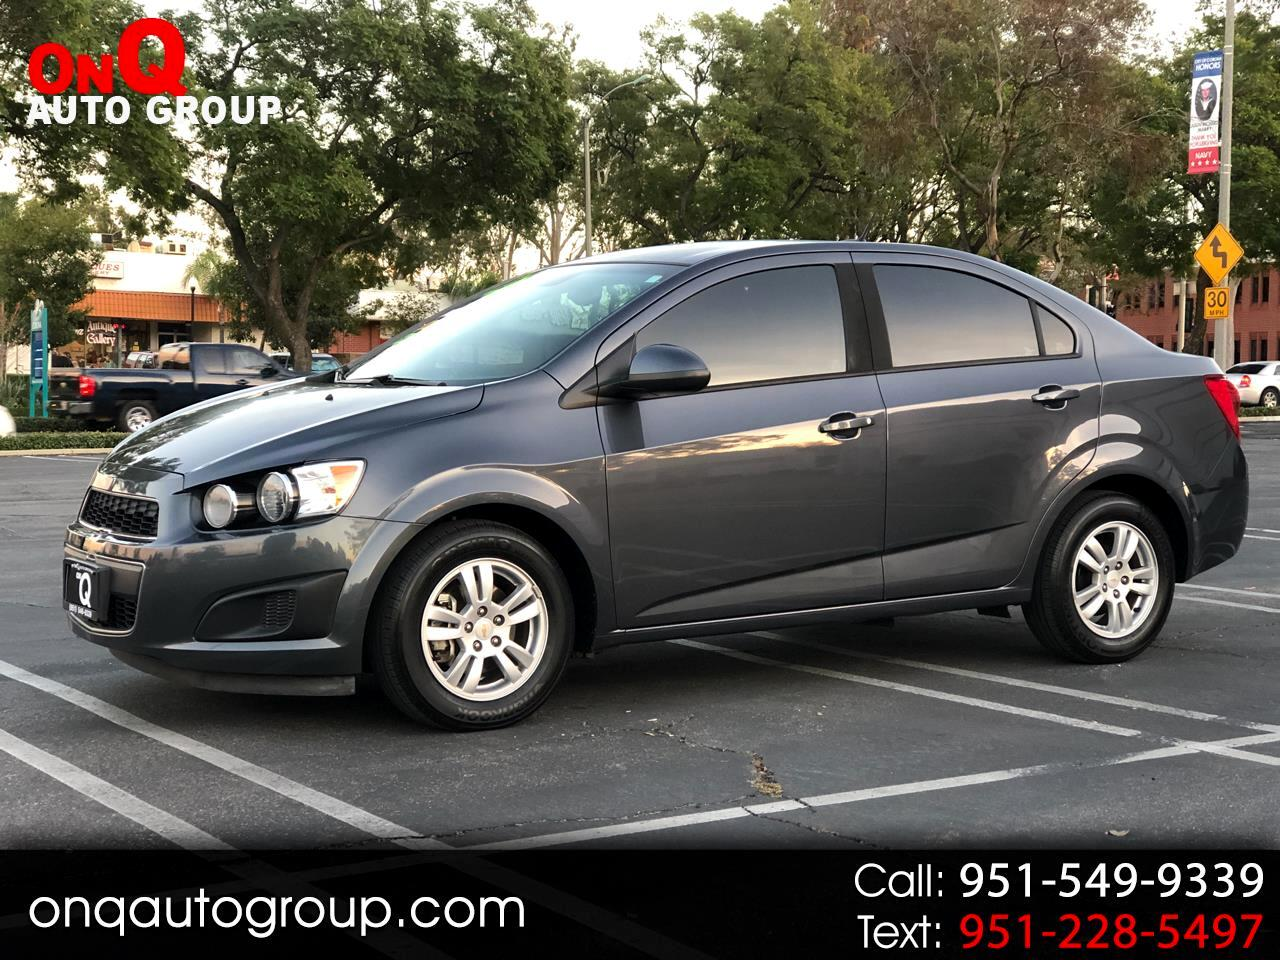 2012 Chevrolet Sonic 4dr Sdn LS 2LS